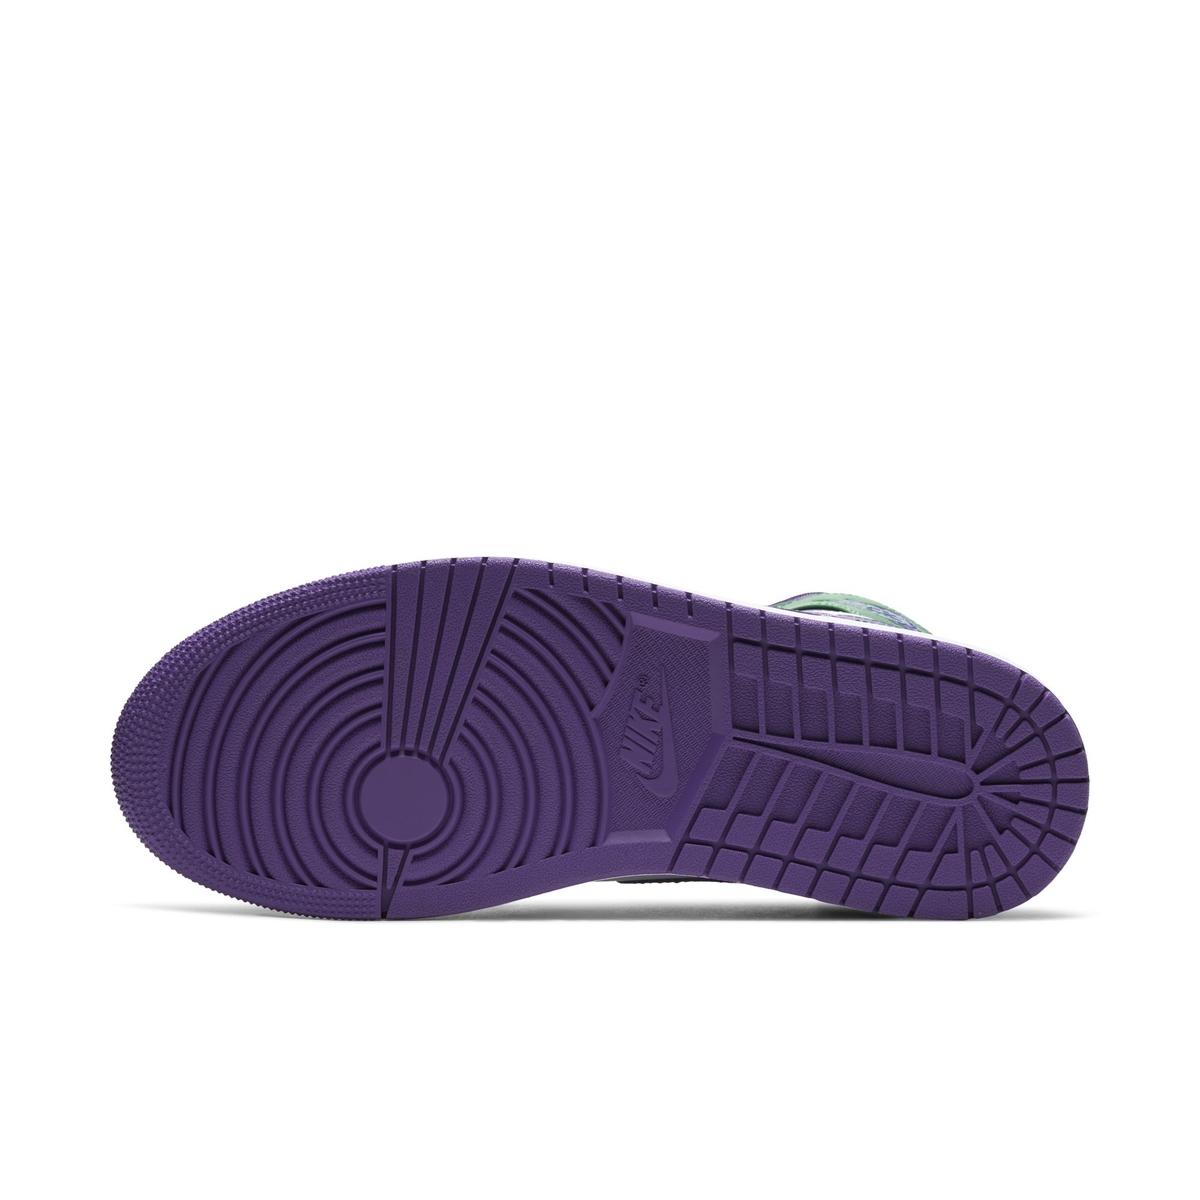 Air Jordan 1 Mid,AJ1 Mid,发售  猛男必看!小丑 Air Jordan 1 Mid 即将发售,你打几分?